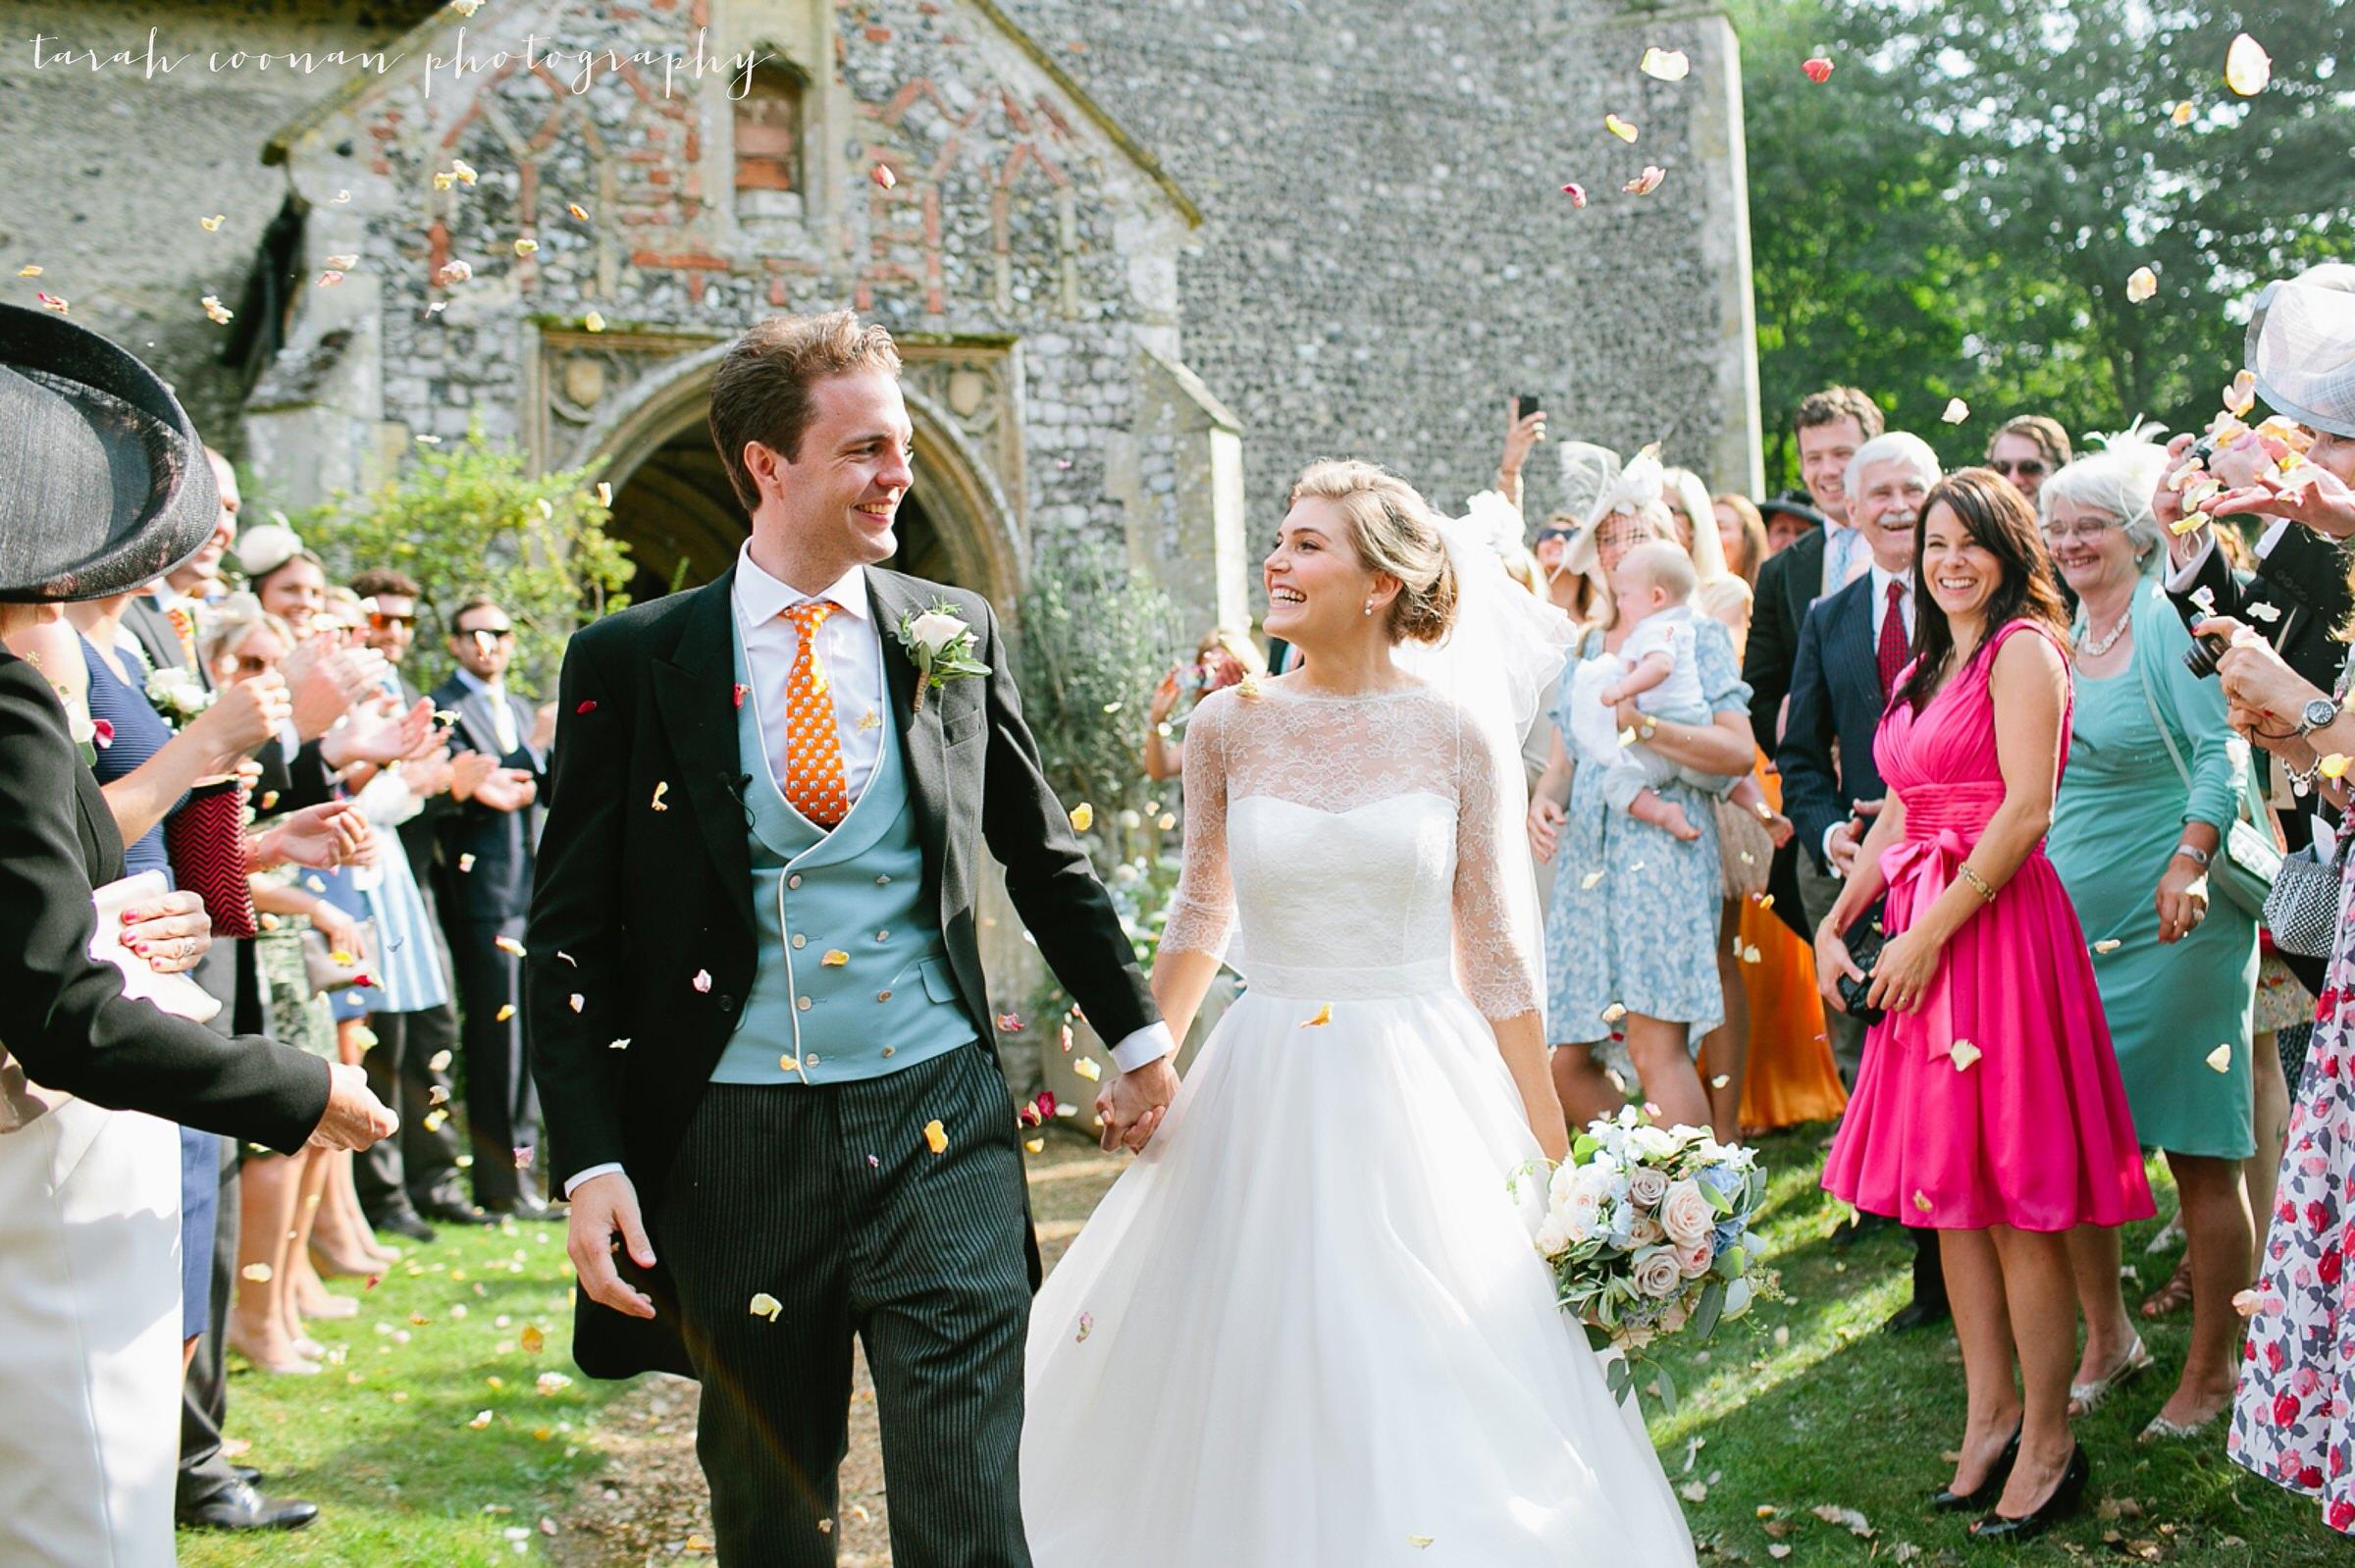 brighton-wedding-photographer32